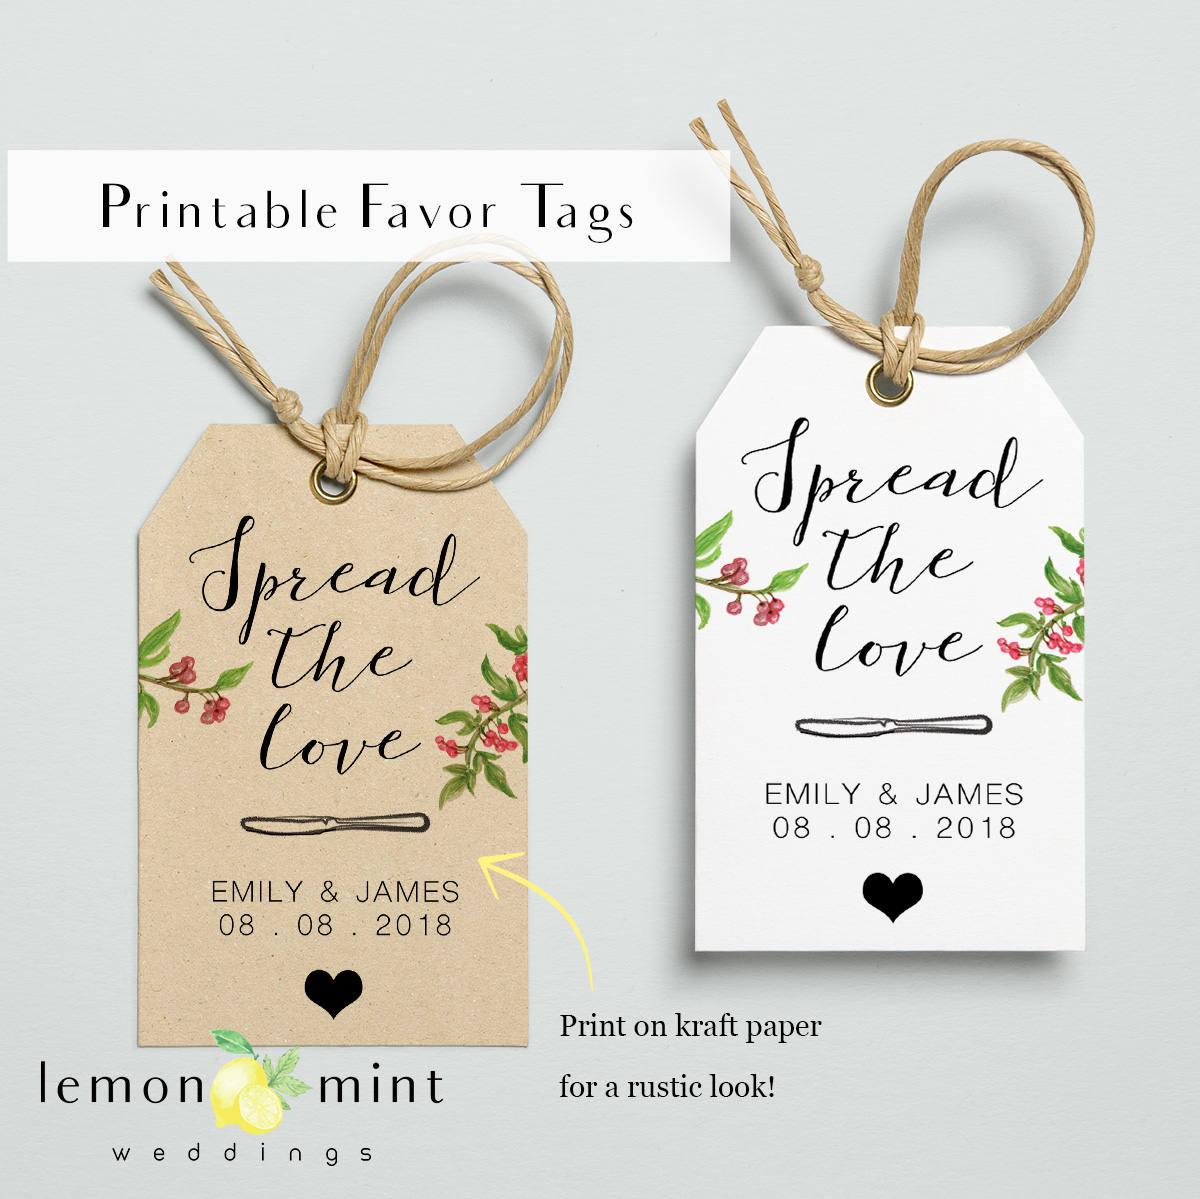 Homemade jam tags spread the love printable wedding favor